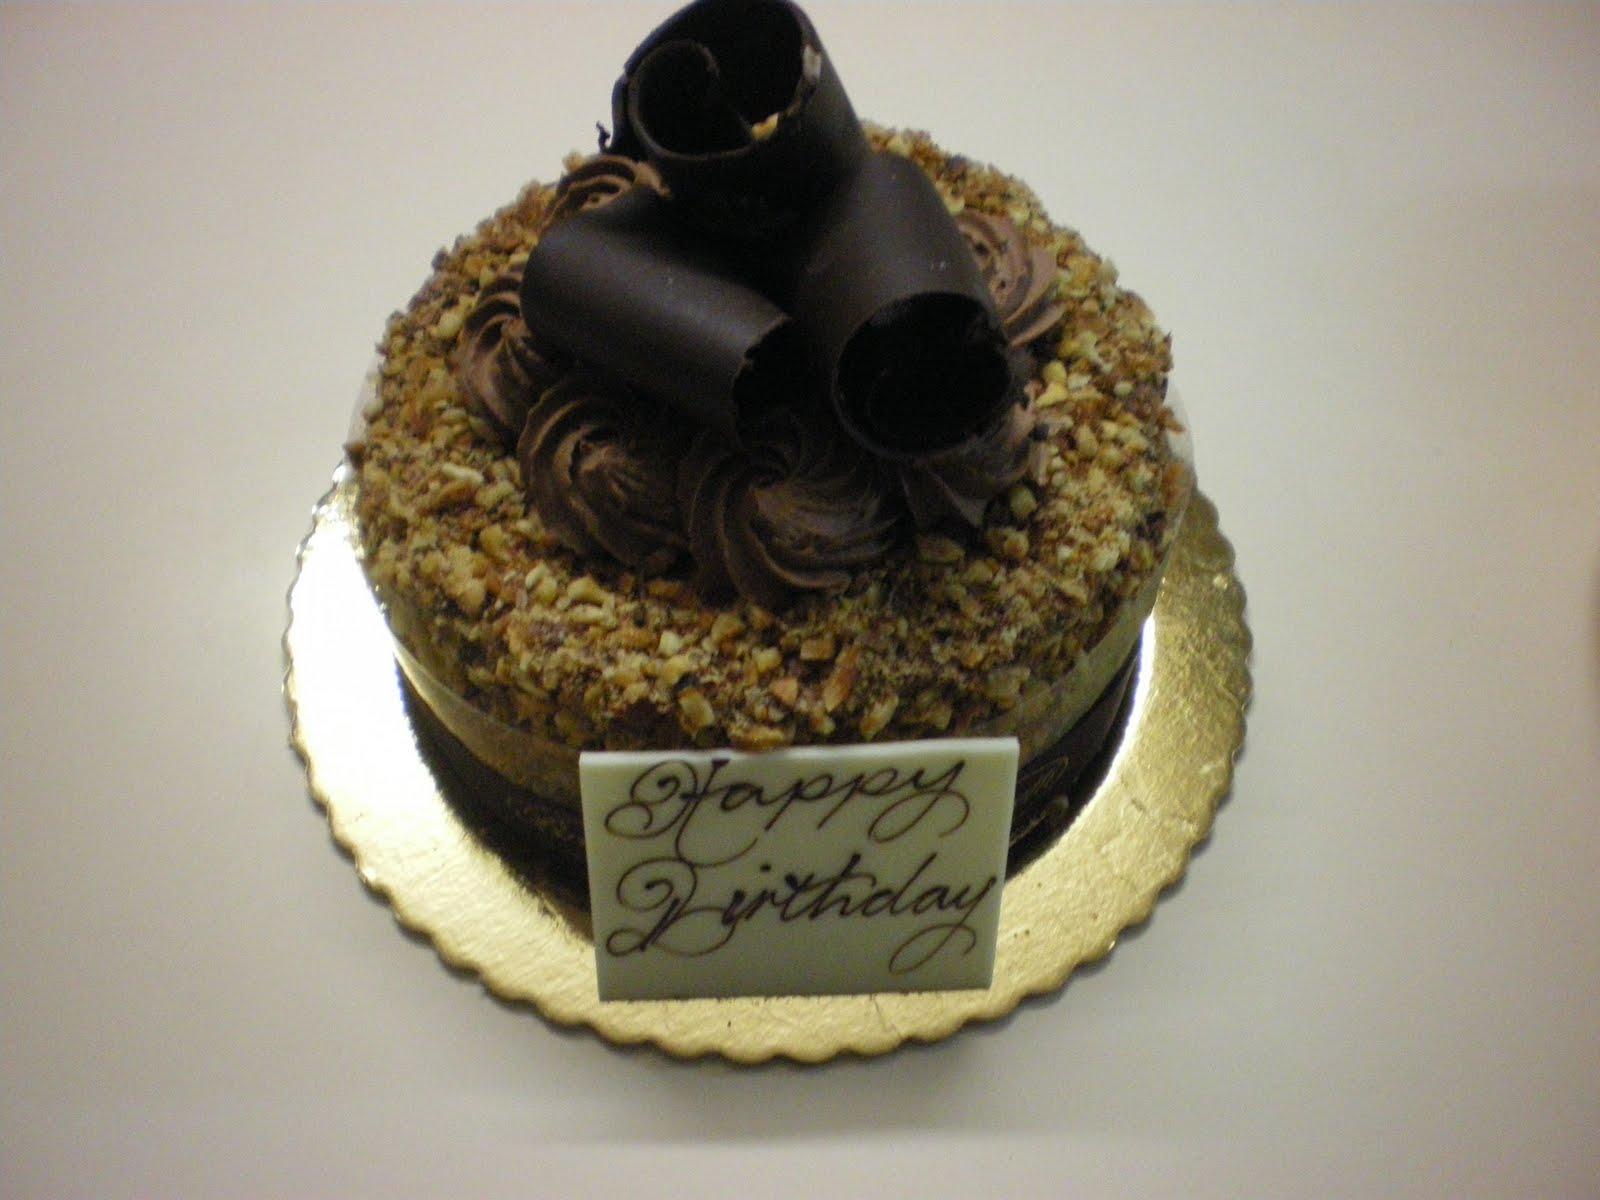 Oh Delish Birthday Cake From Brunetti